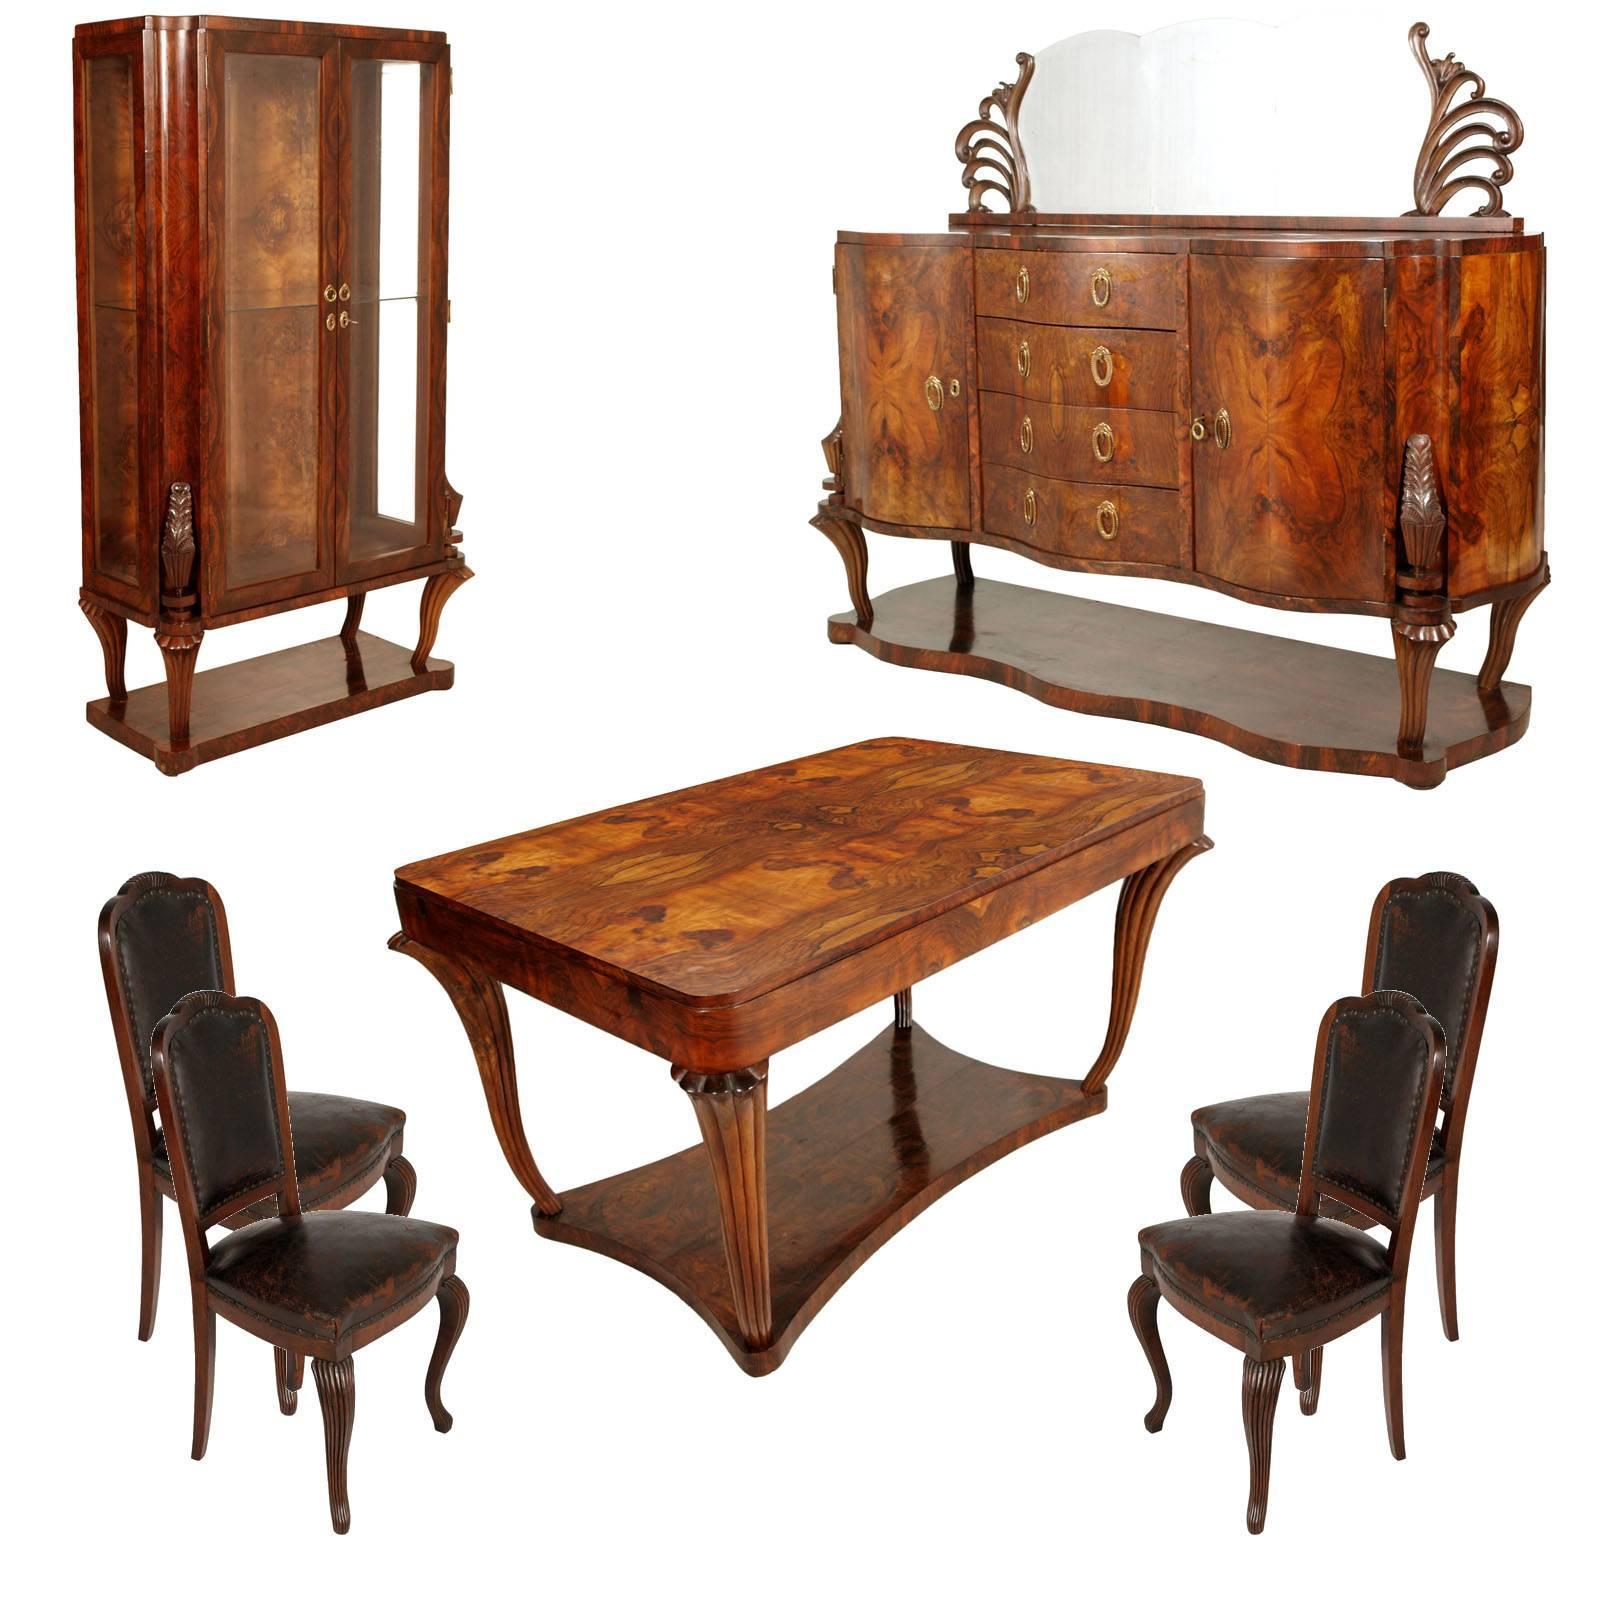 1920s Testolini U0026amp; Salviati Venice Baroque Art Deco Dining Room Set Burl  Walnut